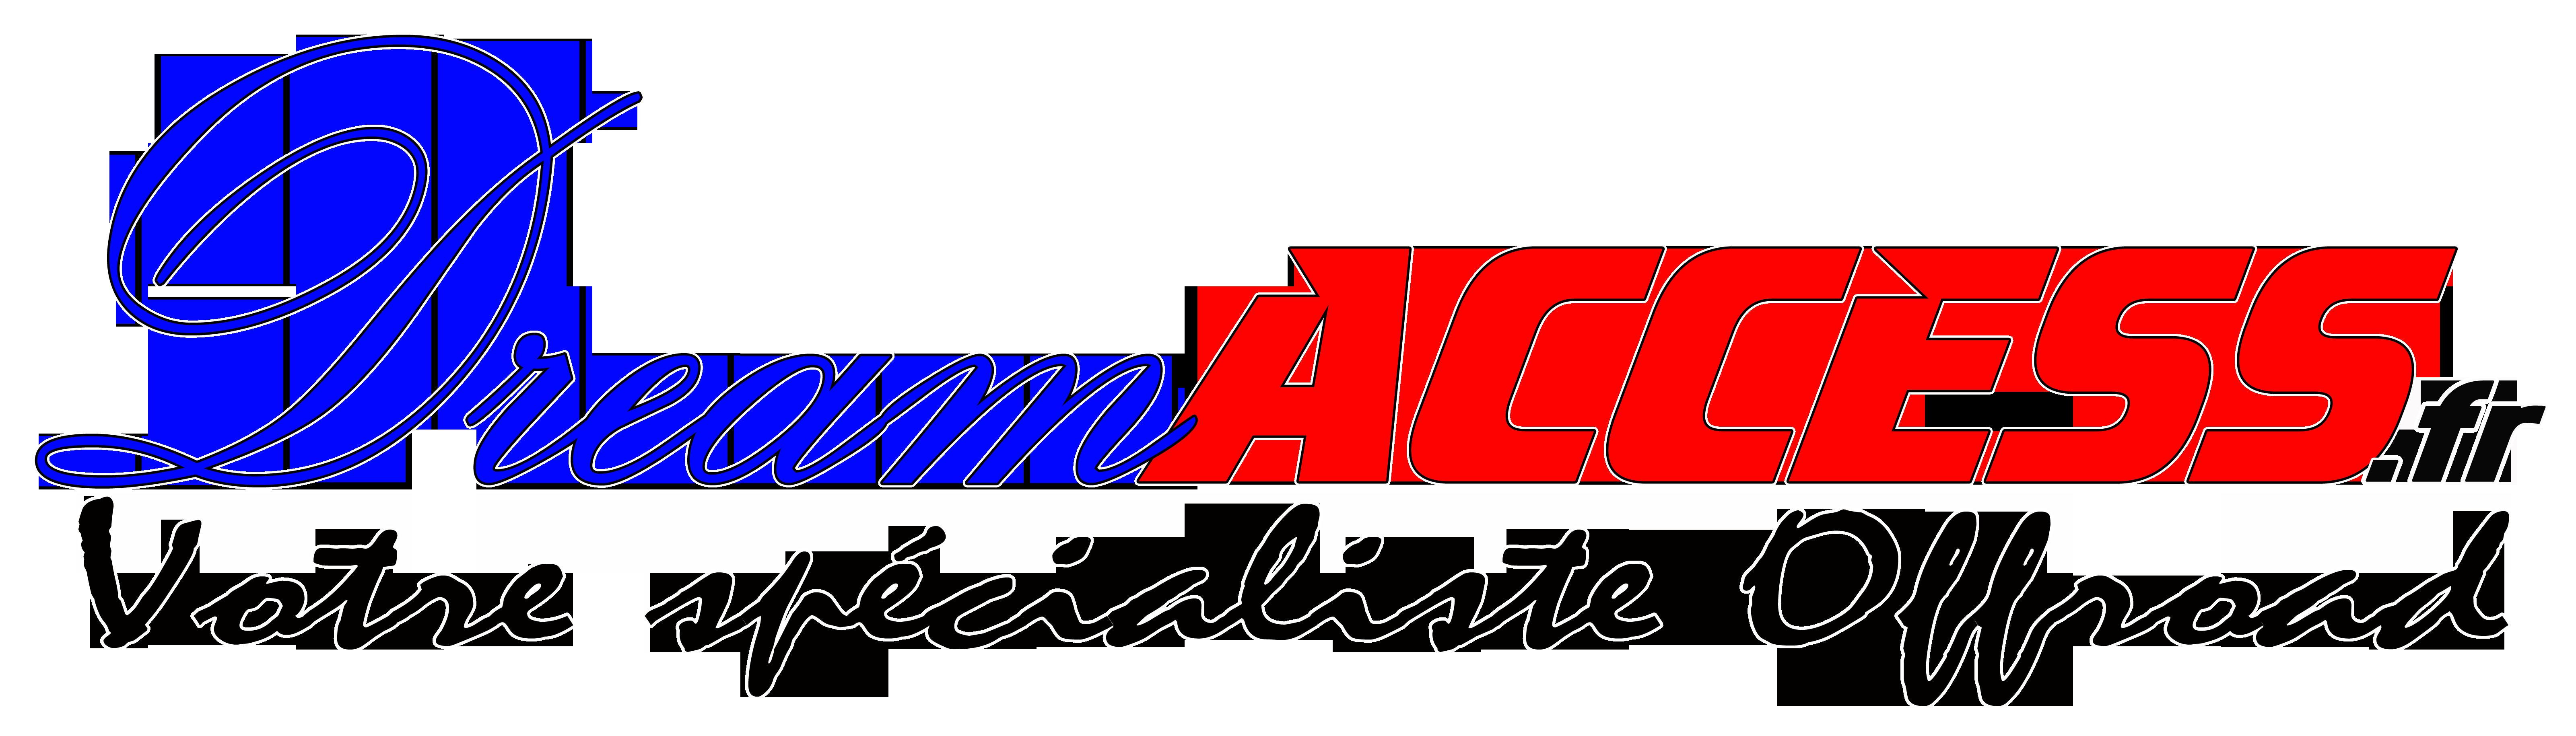 logo image dreamaccess